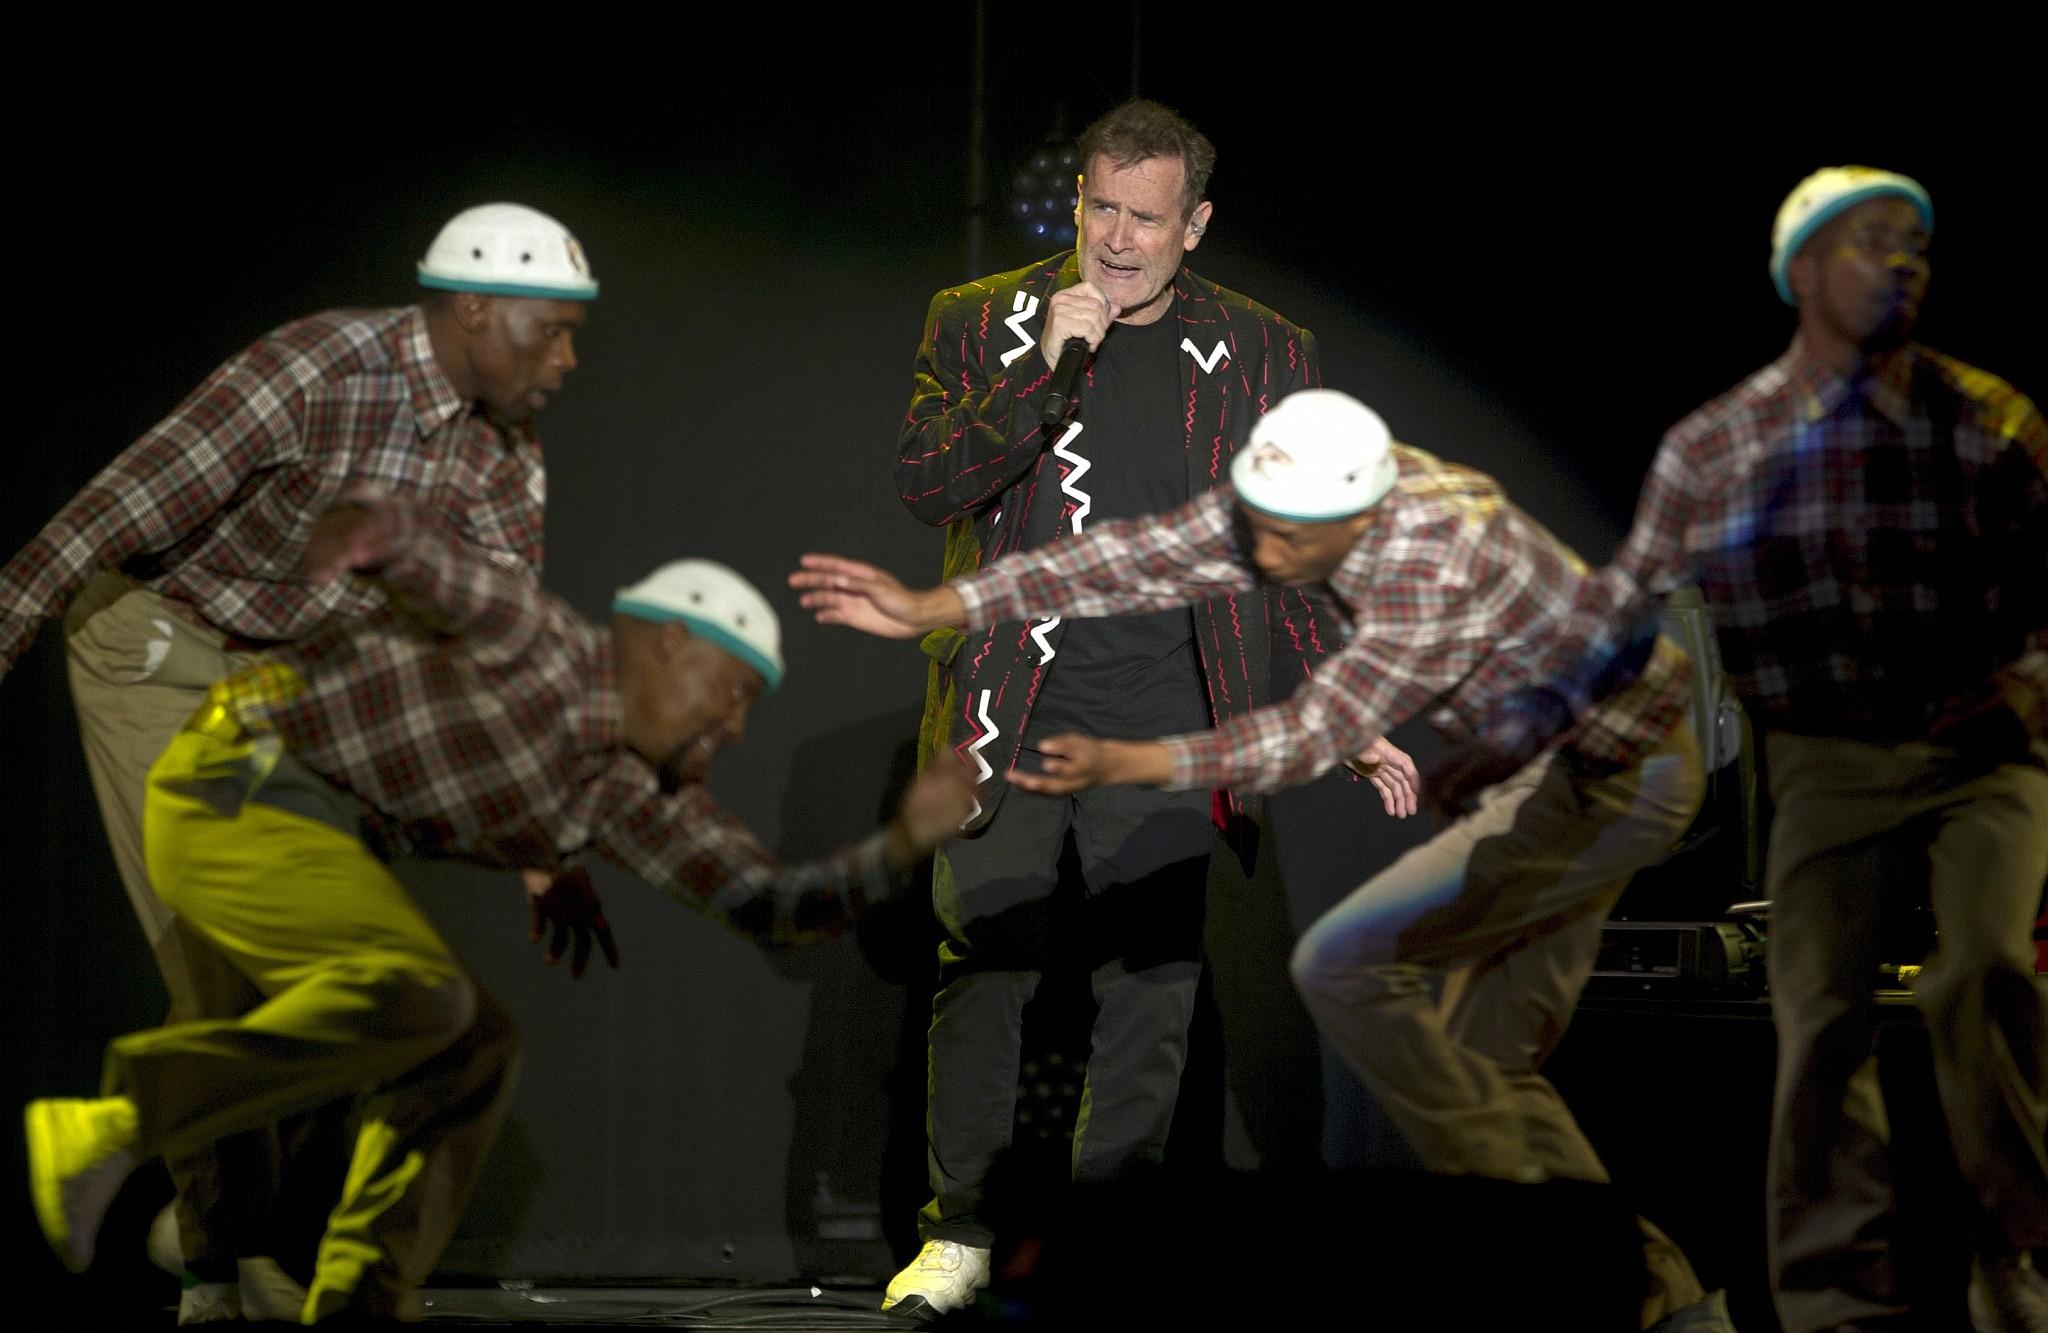 South Africa's Jewish Zulu Johnny Clegg begins last international